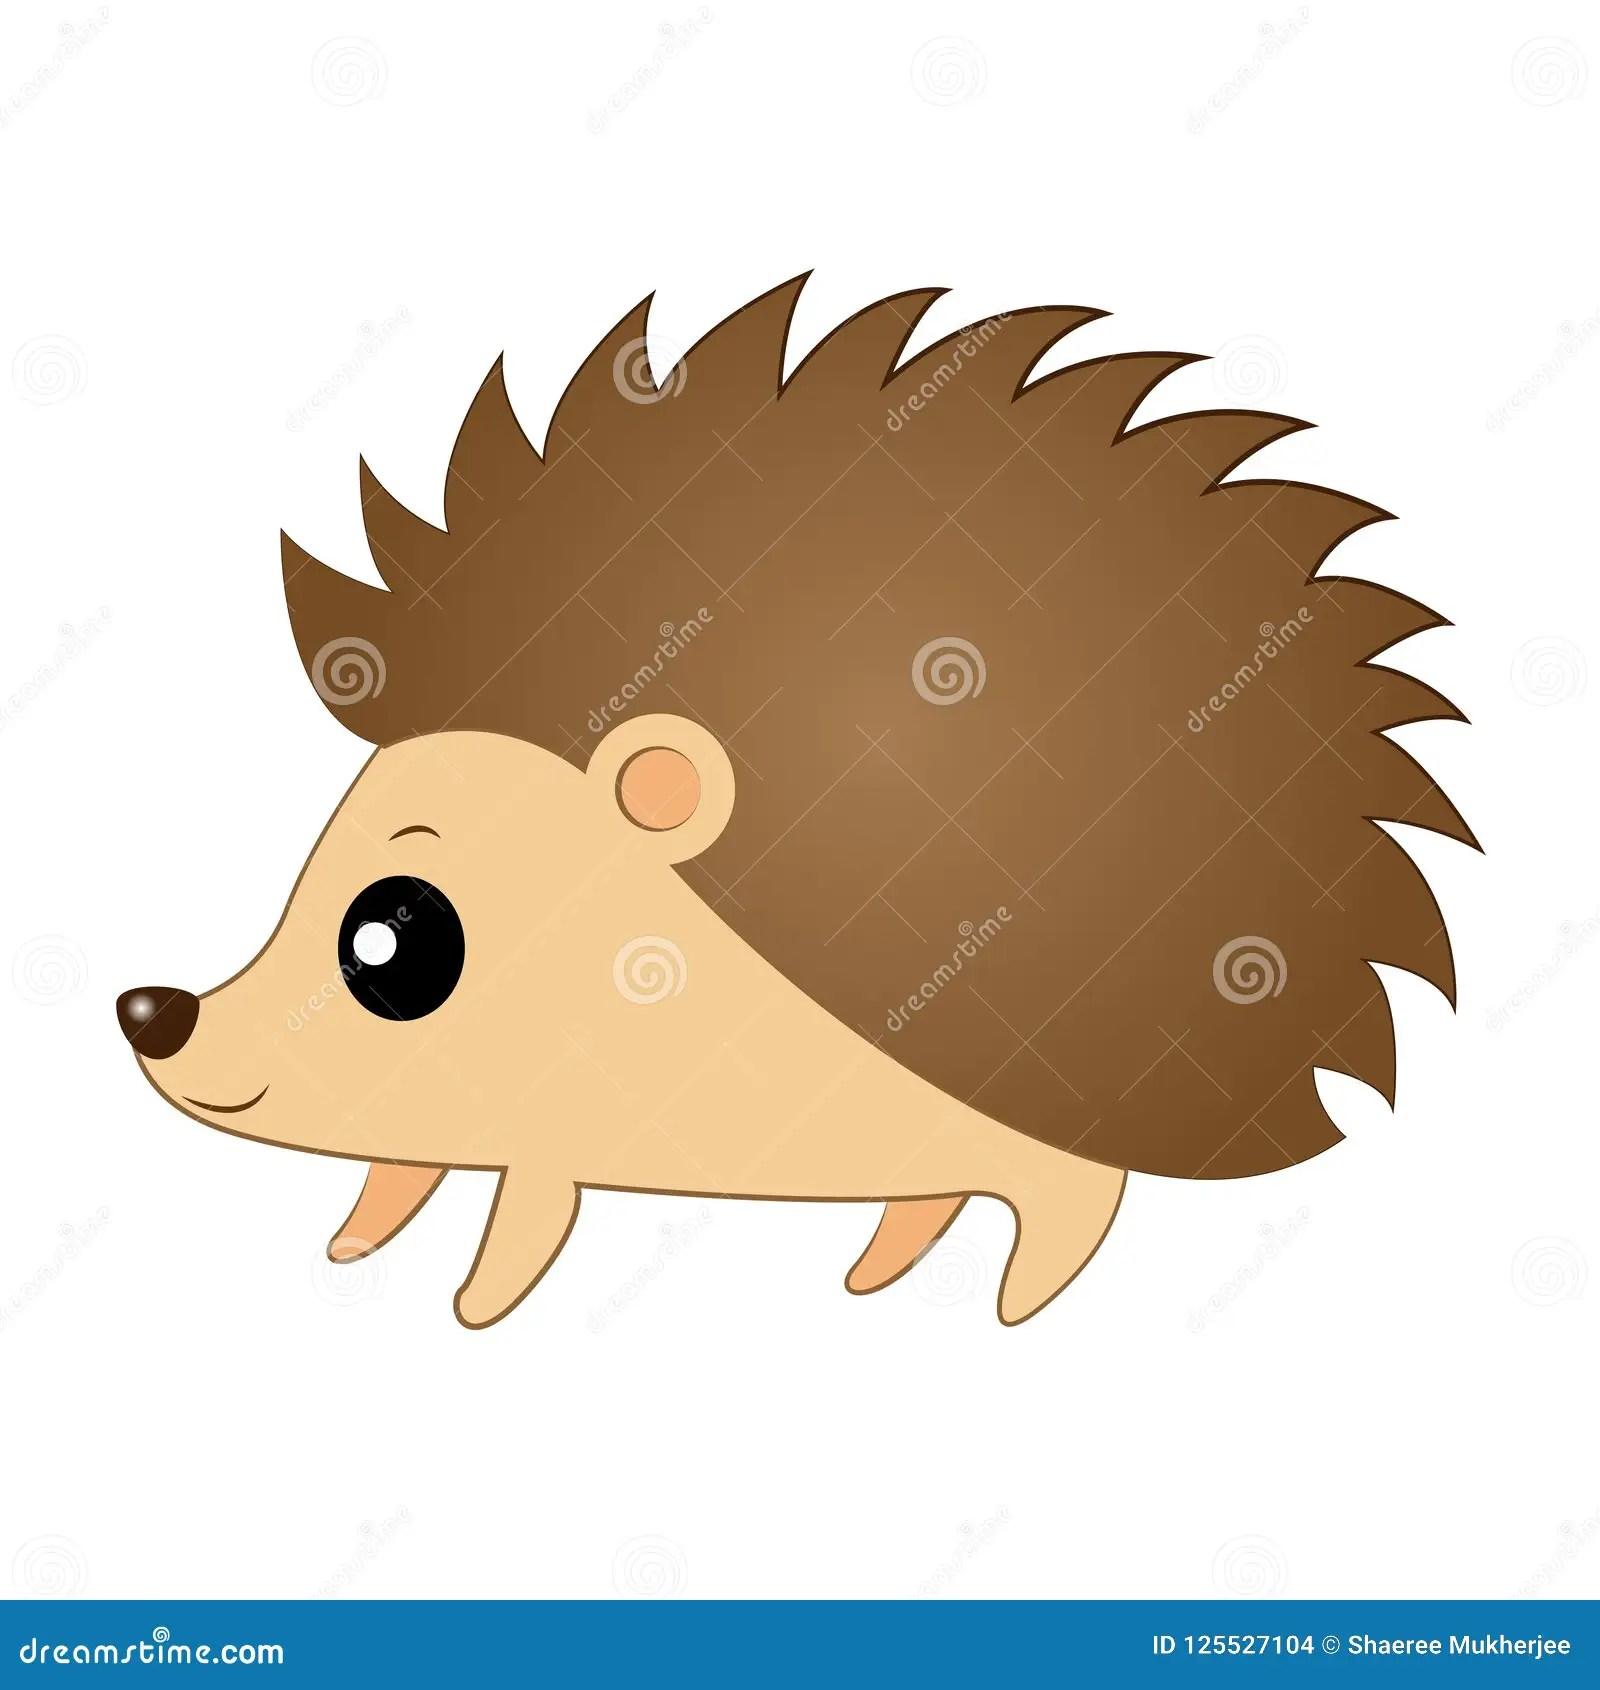 hight resolution of vector illustration clipart cute cartoon hedgehog autumn animal